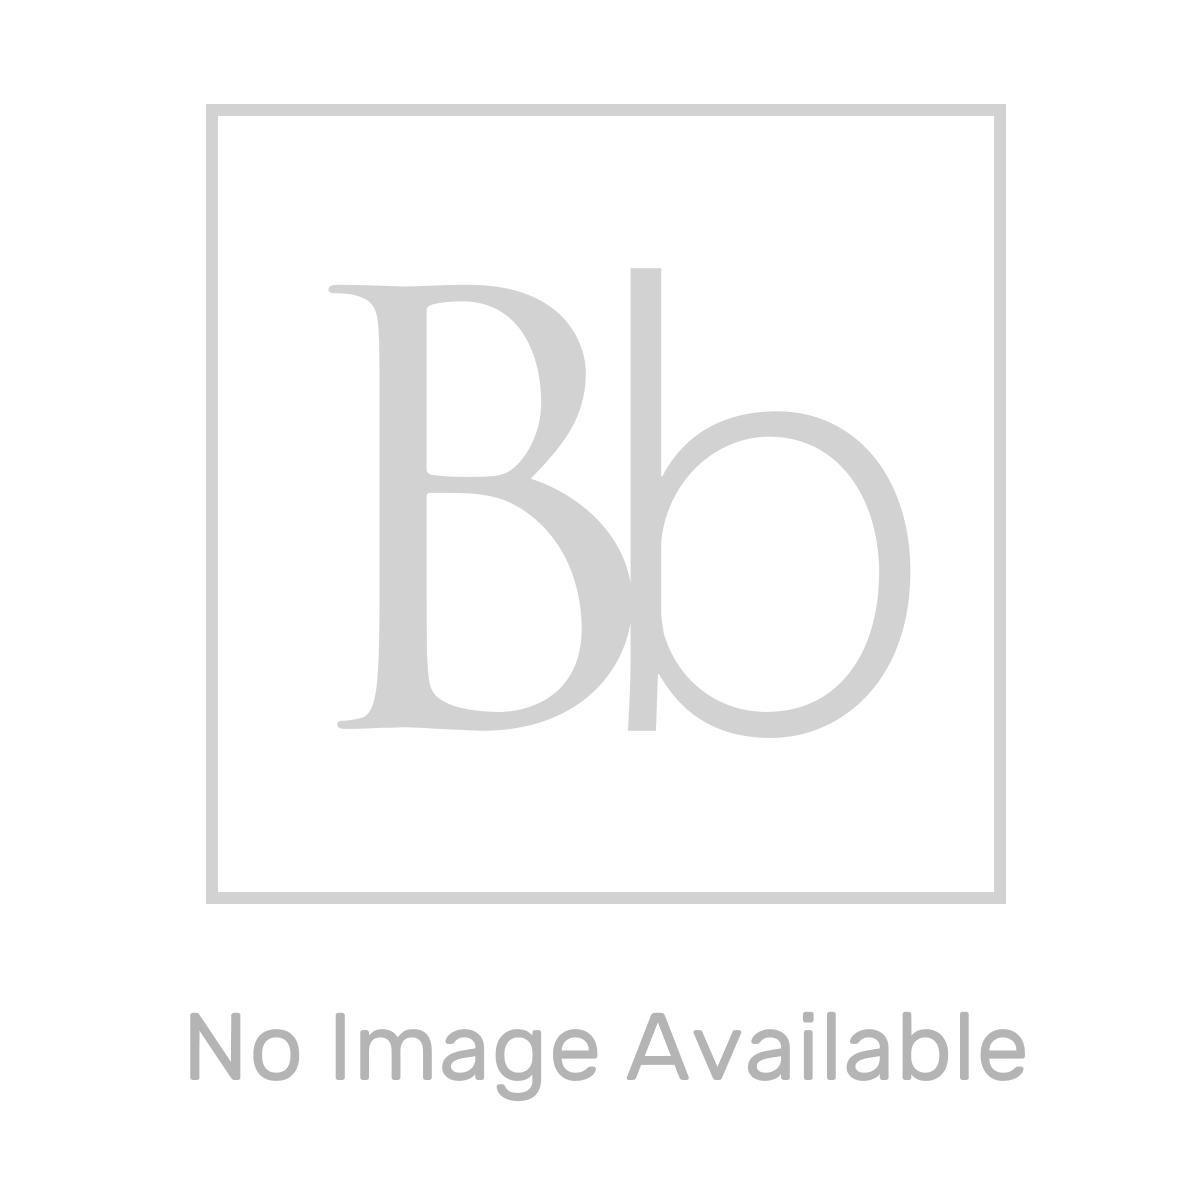 Sensio Avalon Bluetooth Backlit LED mirror 1